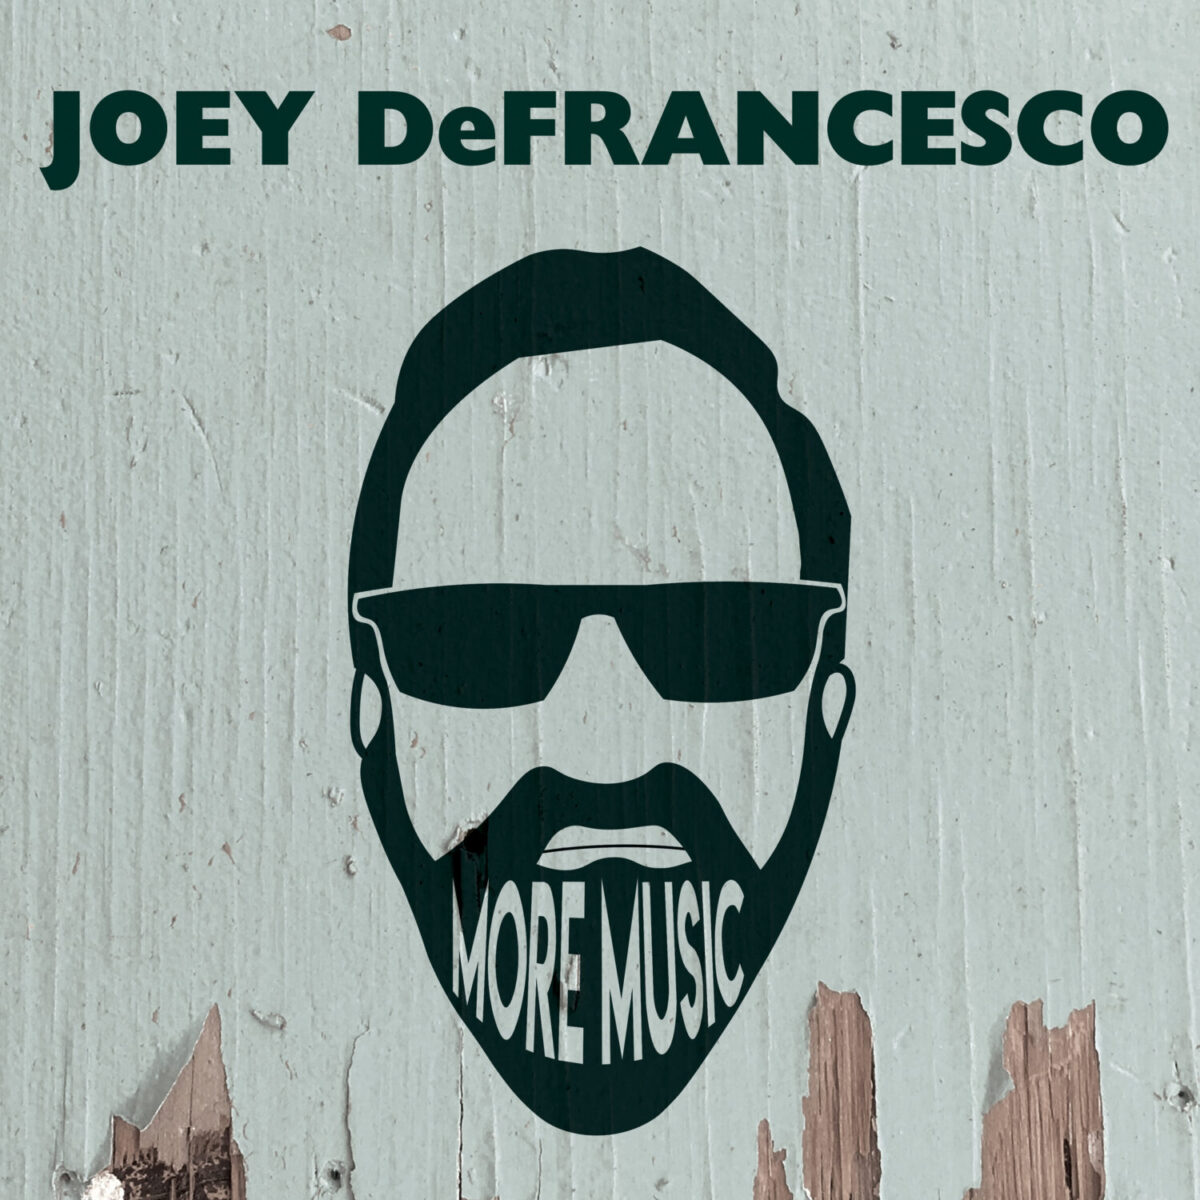 MAC1186 Joey DeFrancesco_More Music cover 3000x3000 rgb